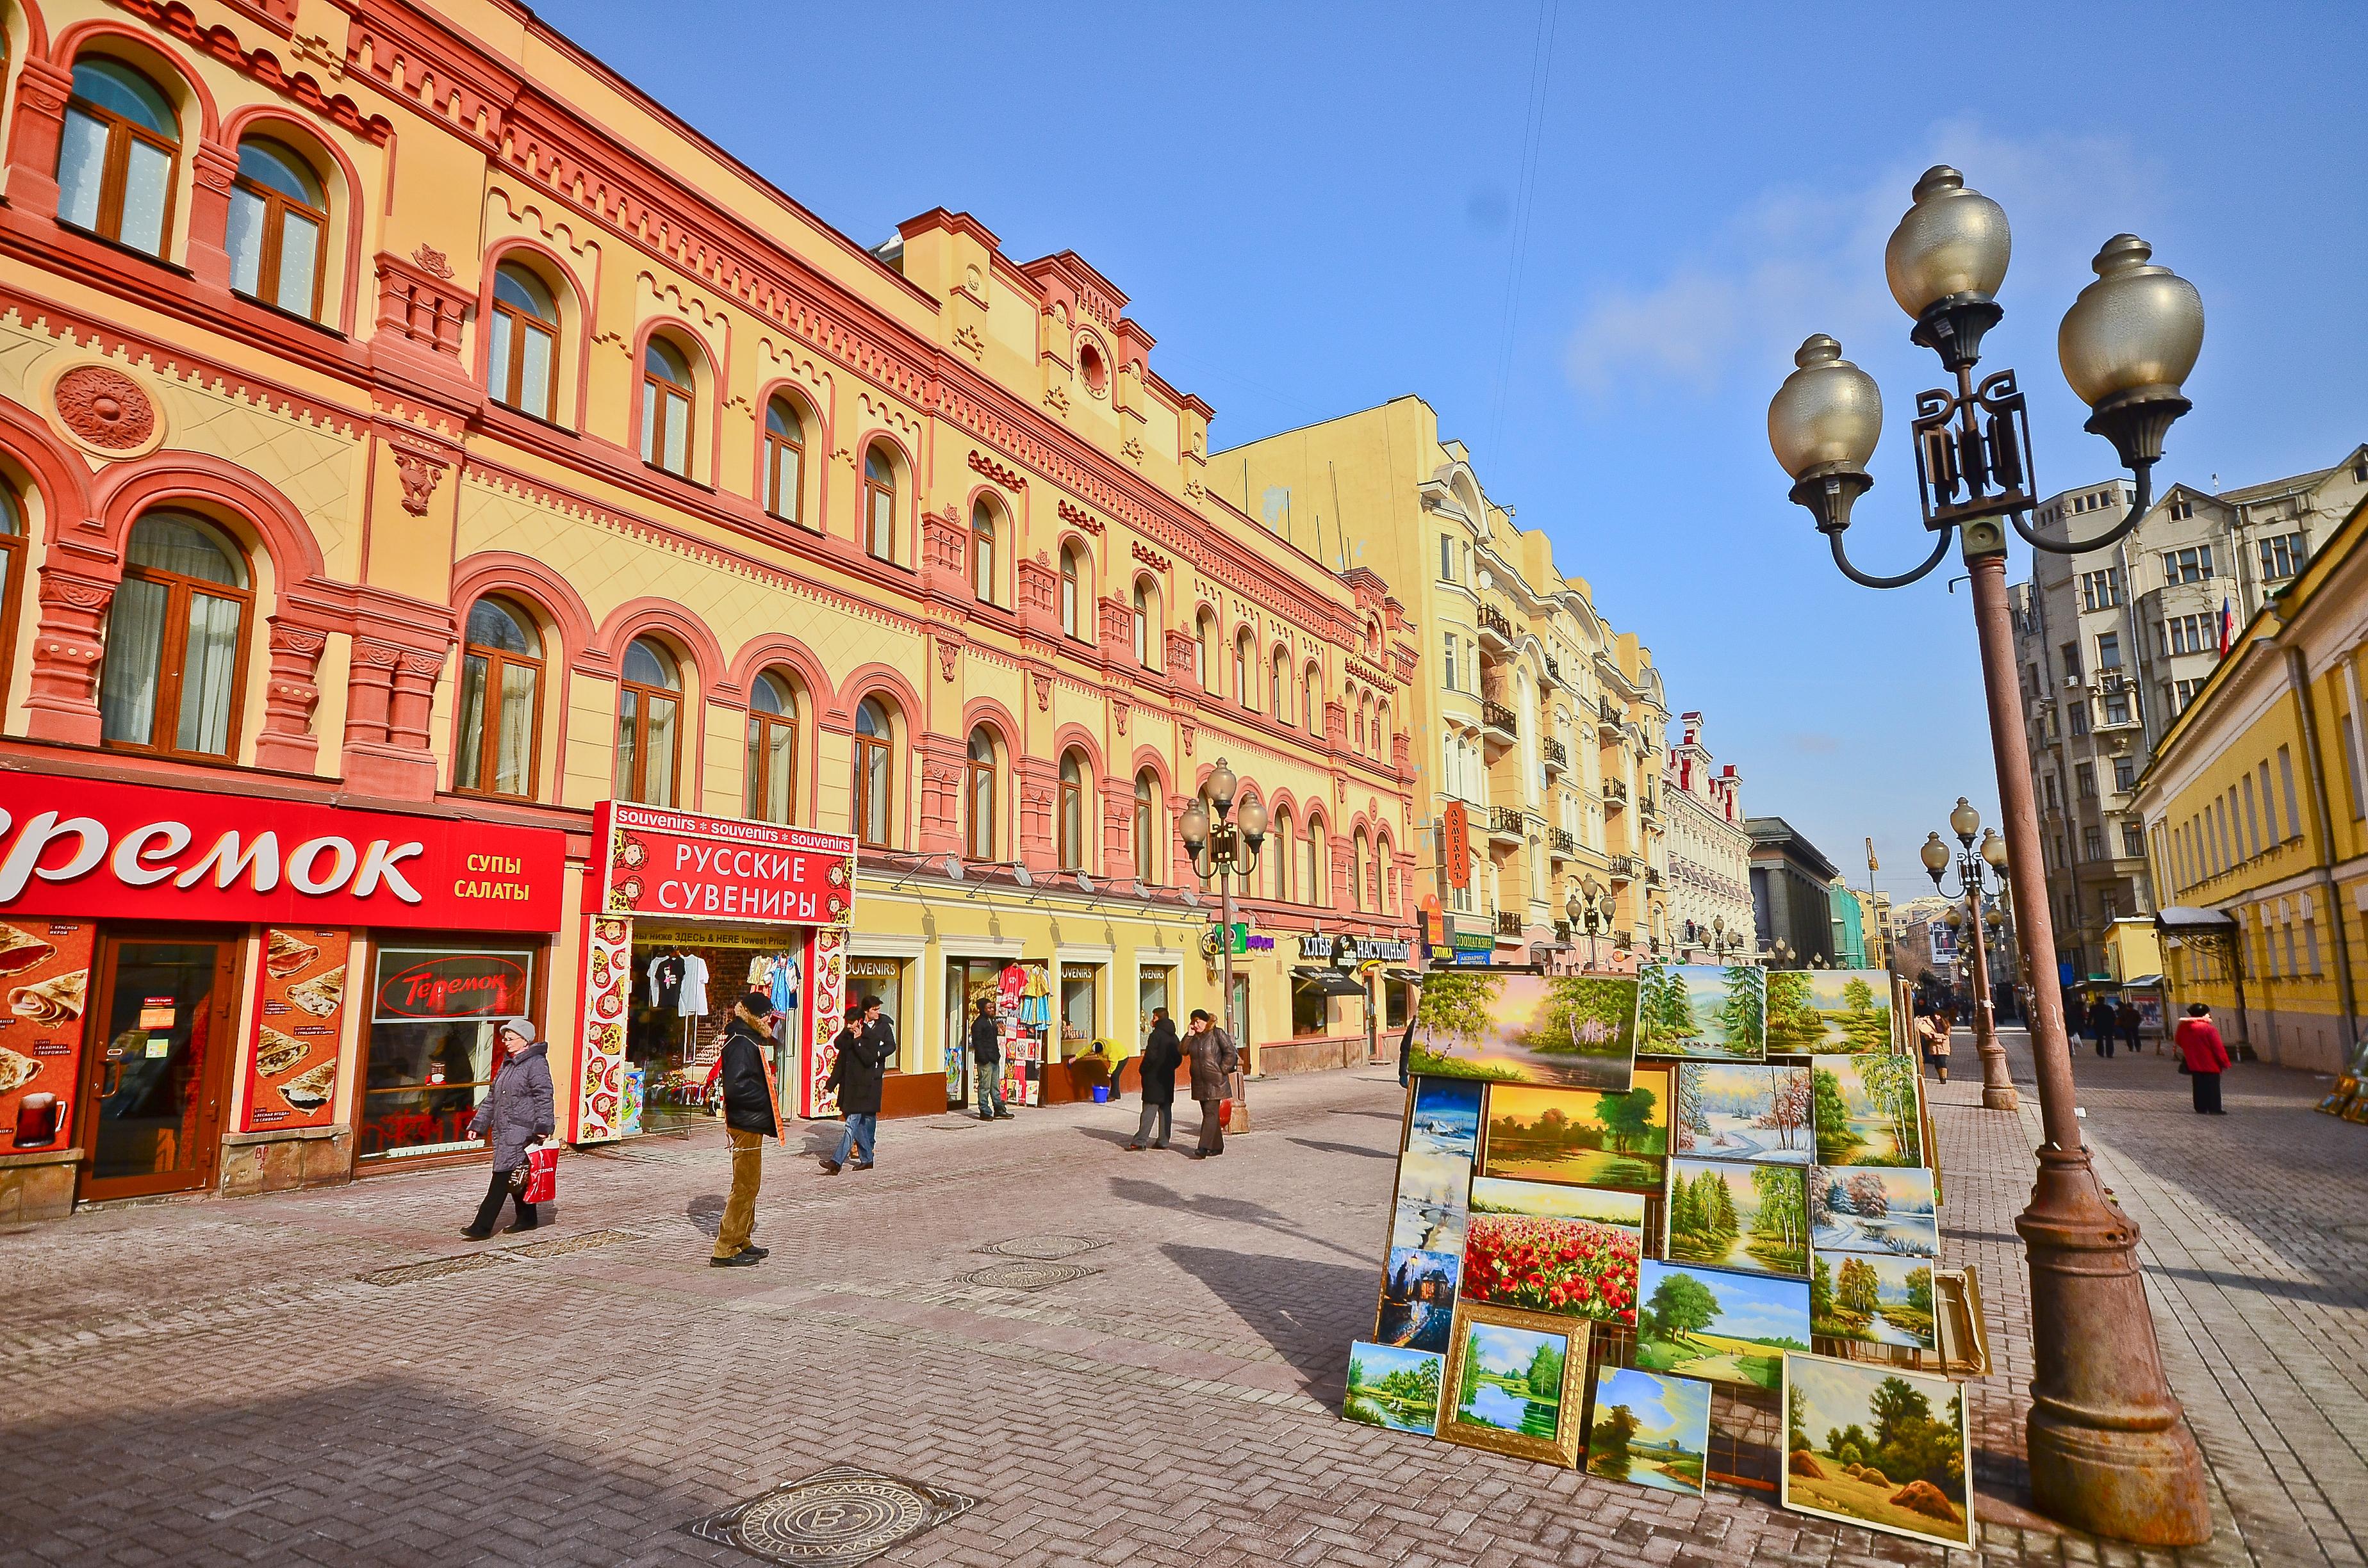 Dreamstime © - Moscou - Vieil Arbat.jpg